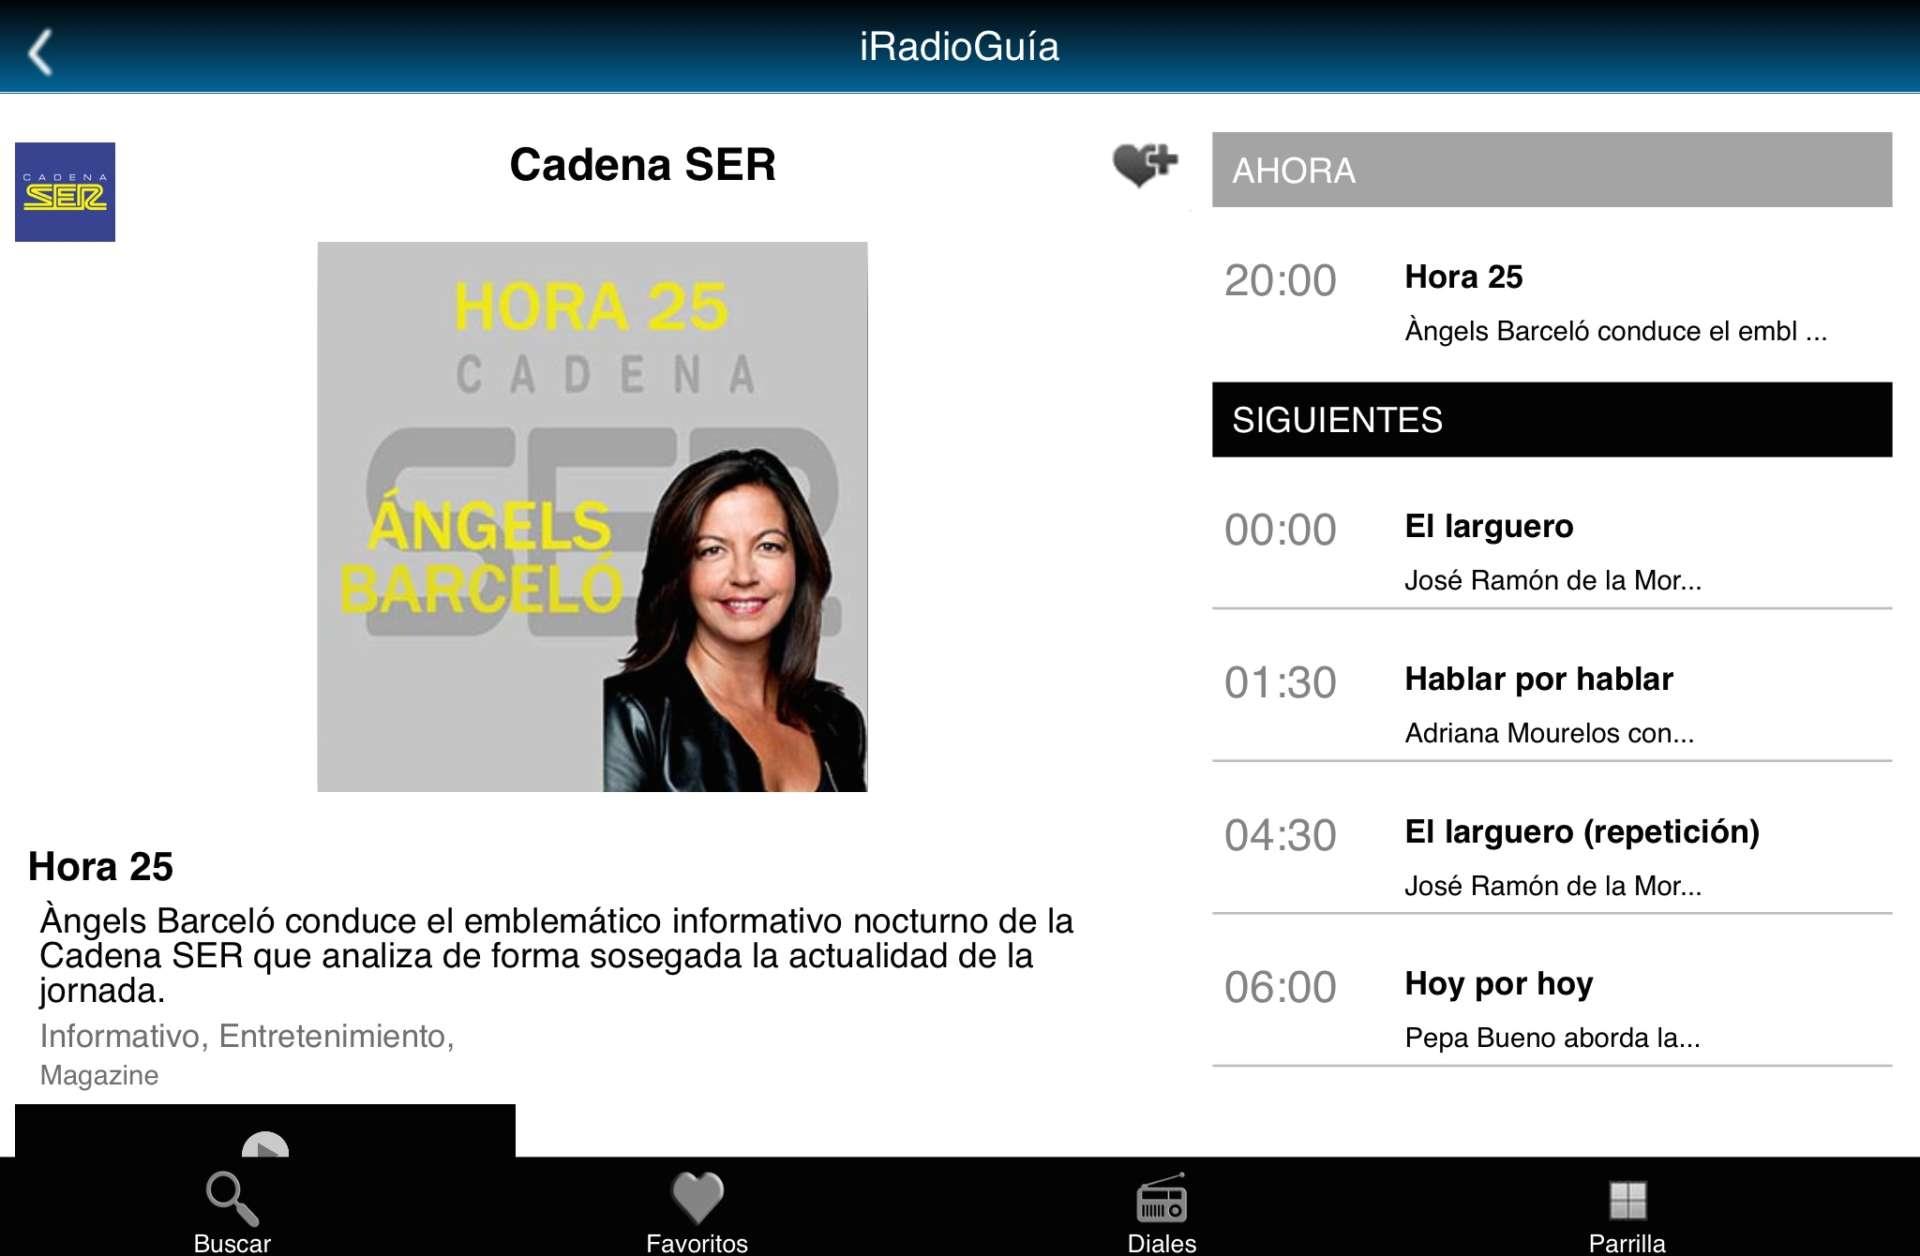 iRadioGuía2